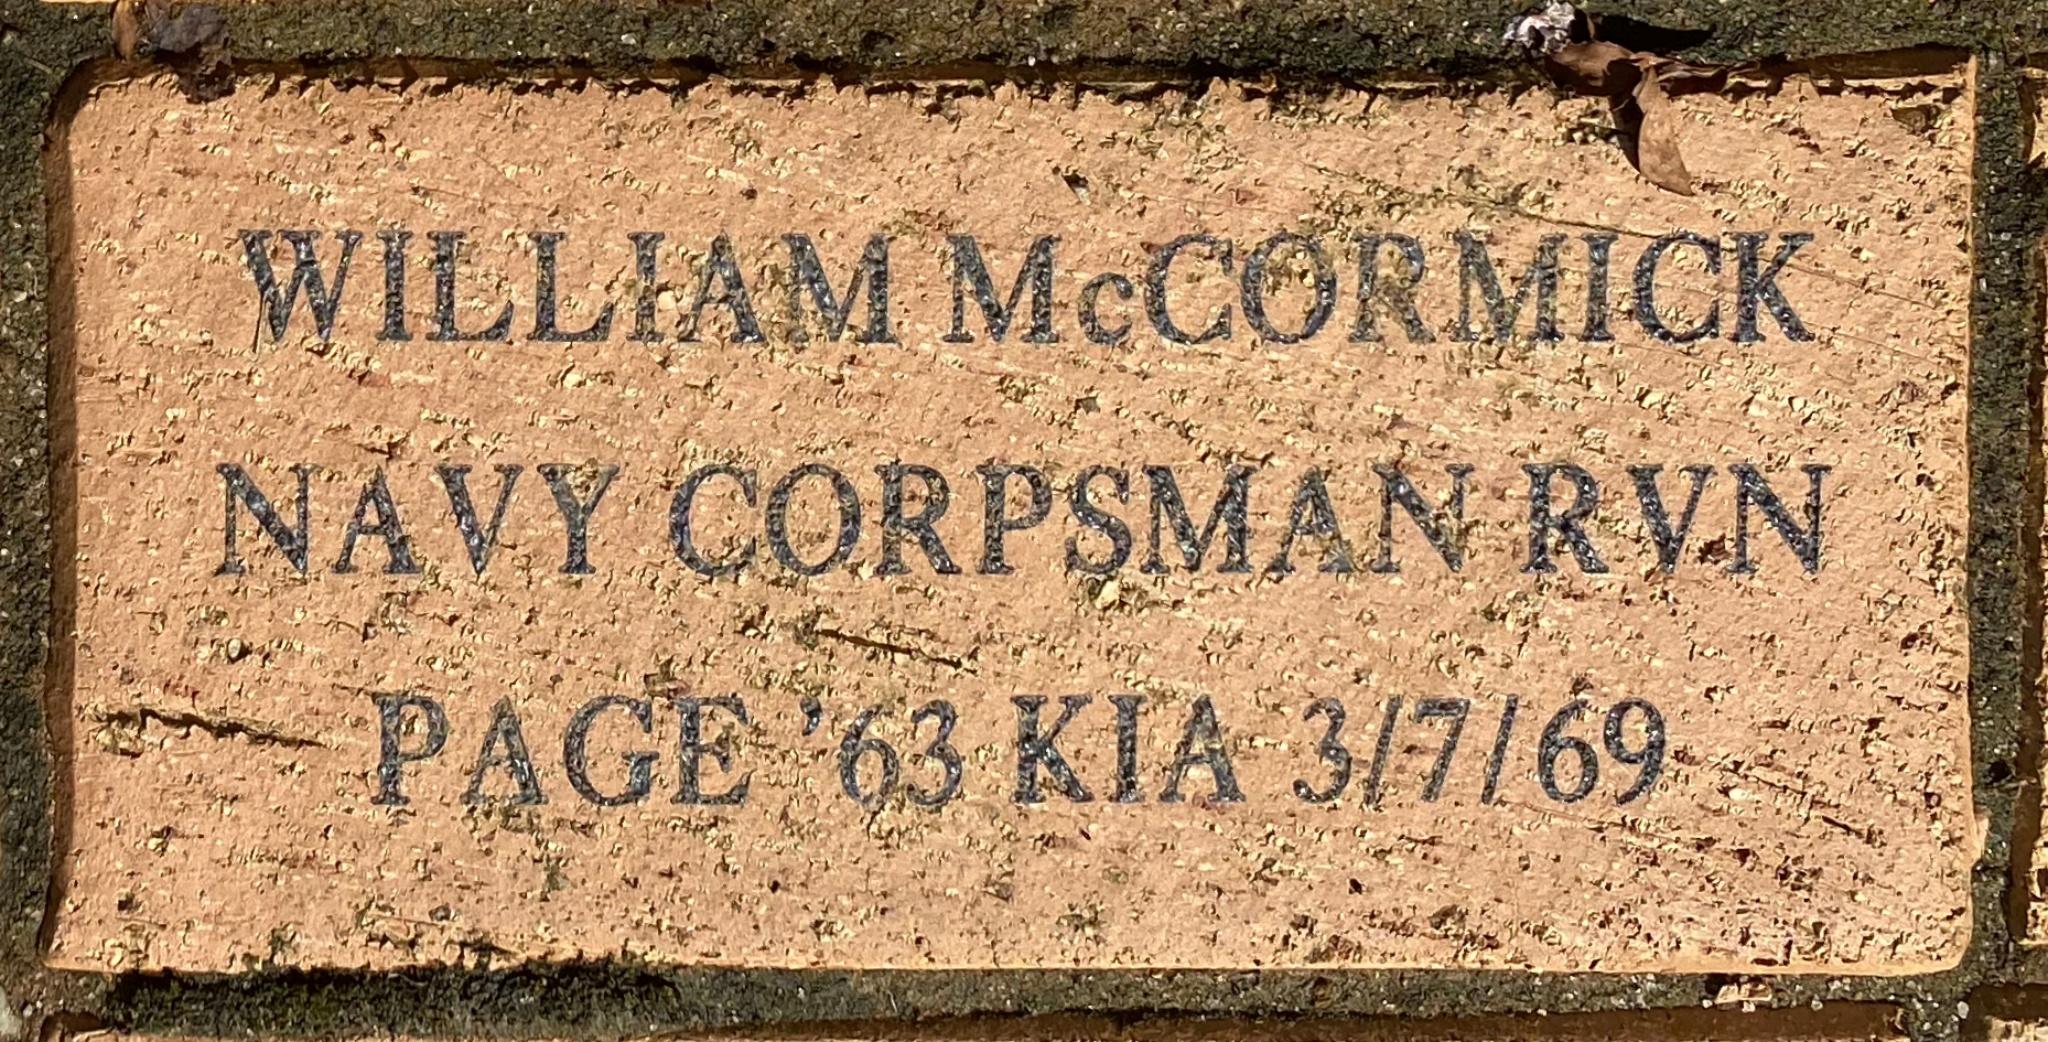 William McCormick Navy Corpsman RVN Page '63 KIA 3/7/69